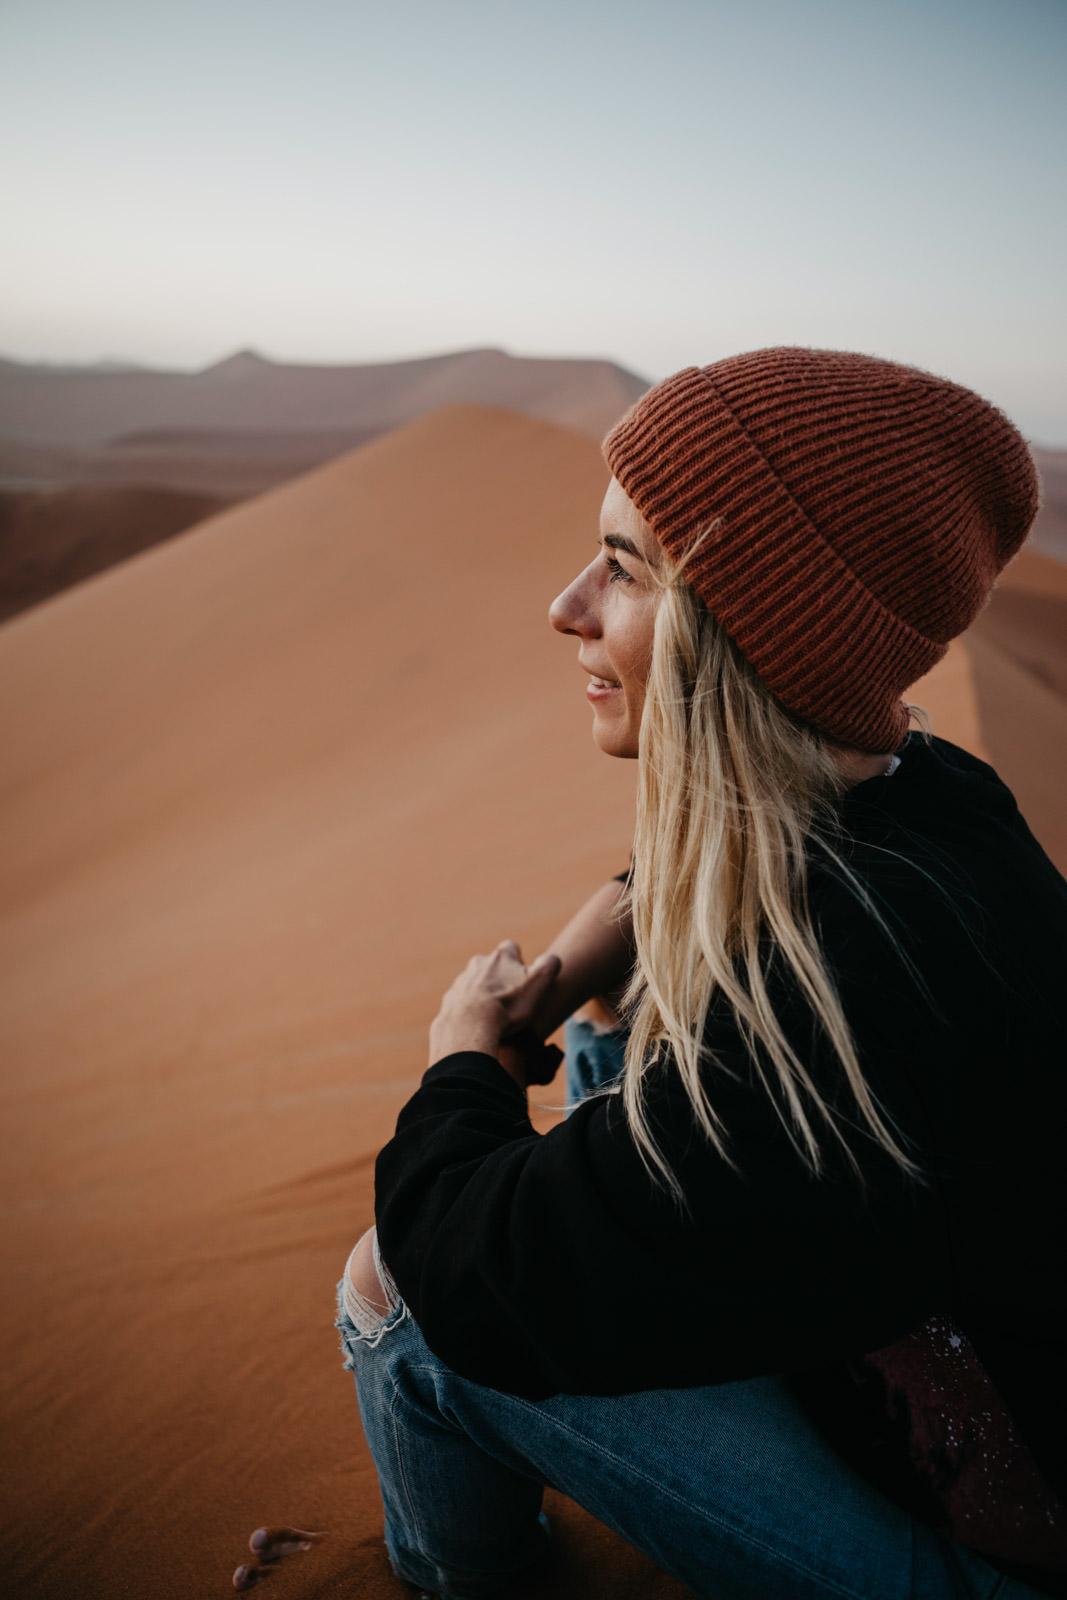 namibia_trip_rooftent_camping_roadtrip (8 von 26).jpg